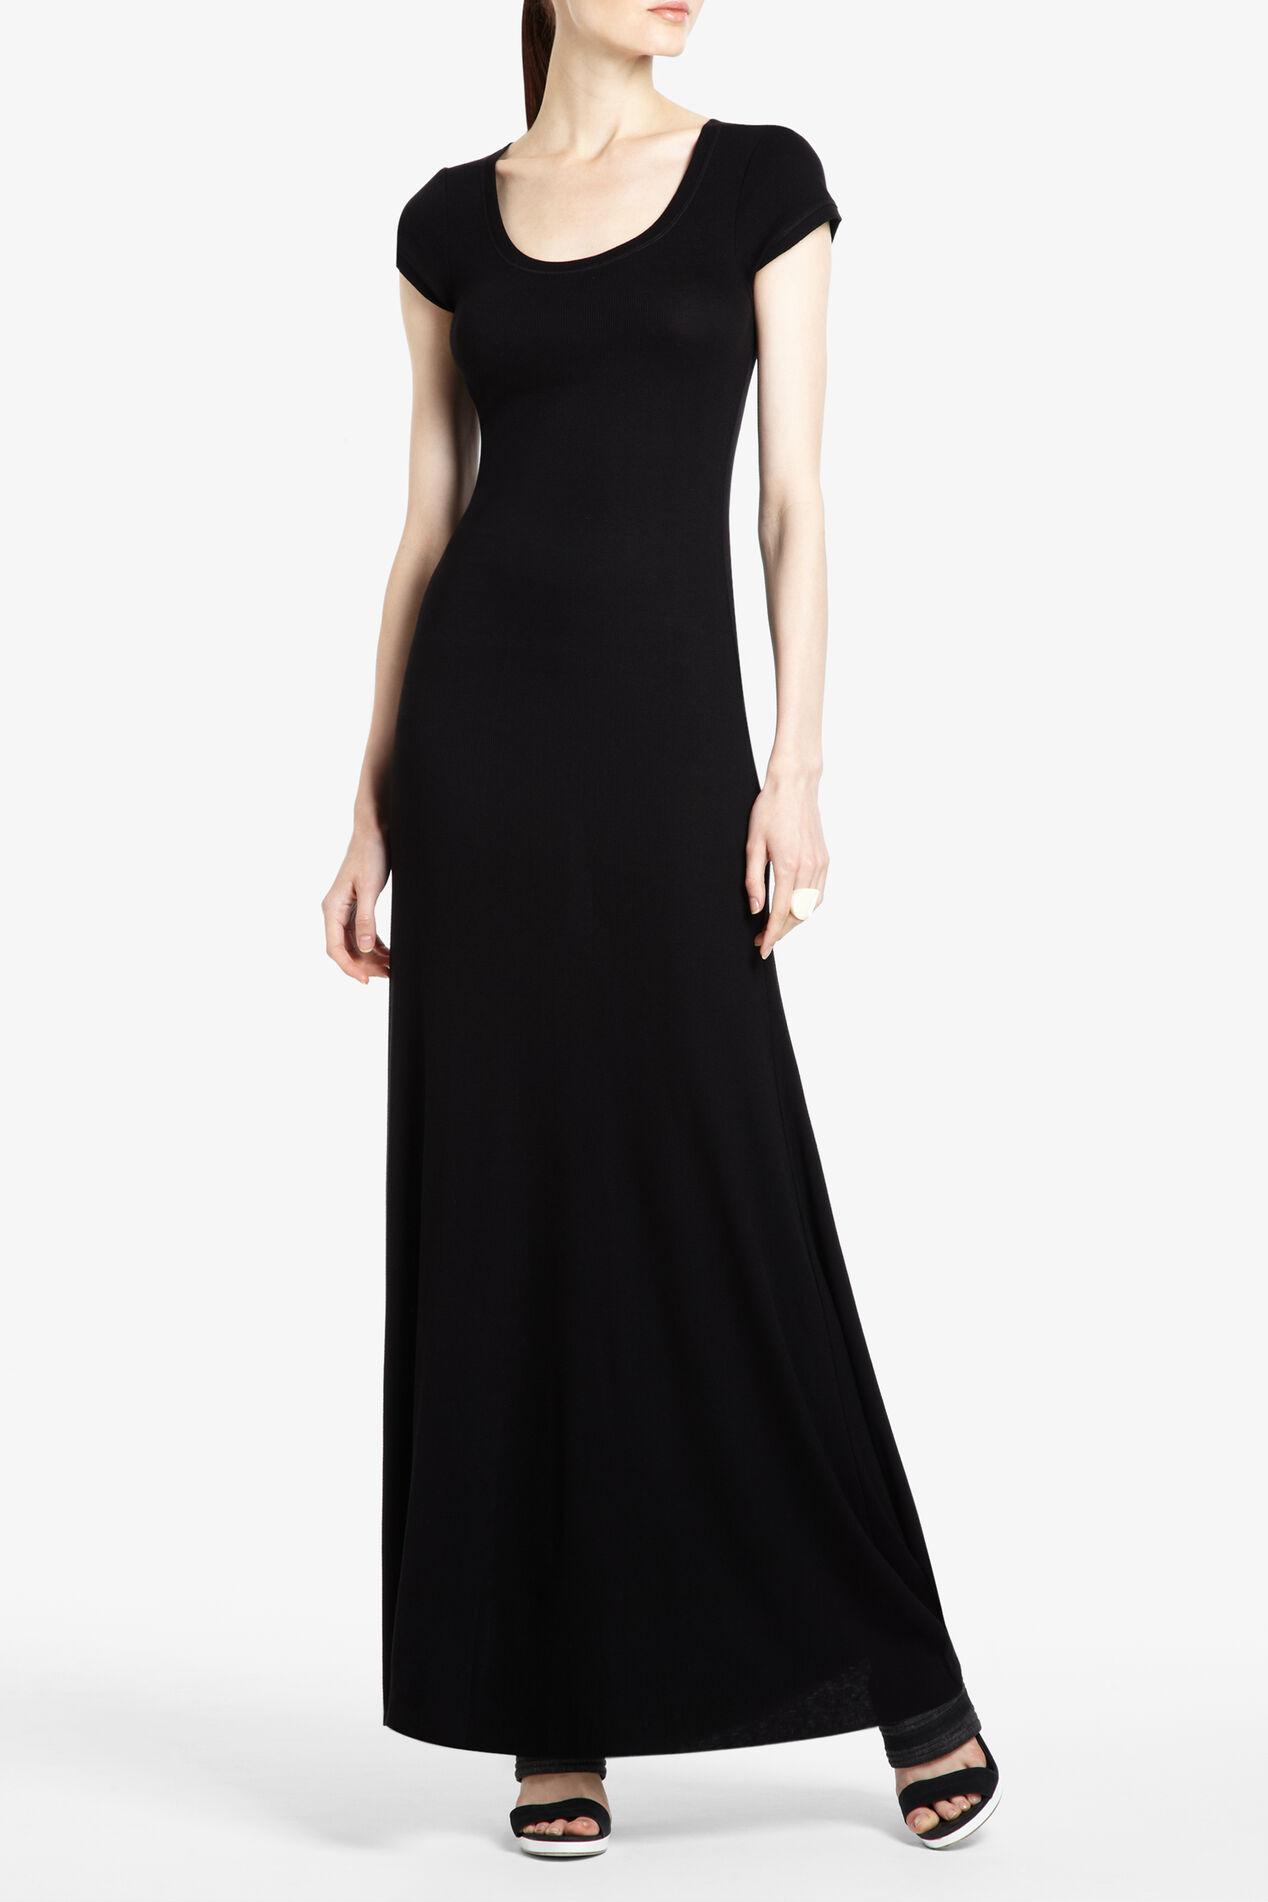 Lexie Short-Sleeve Maxi Dress